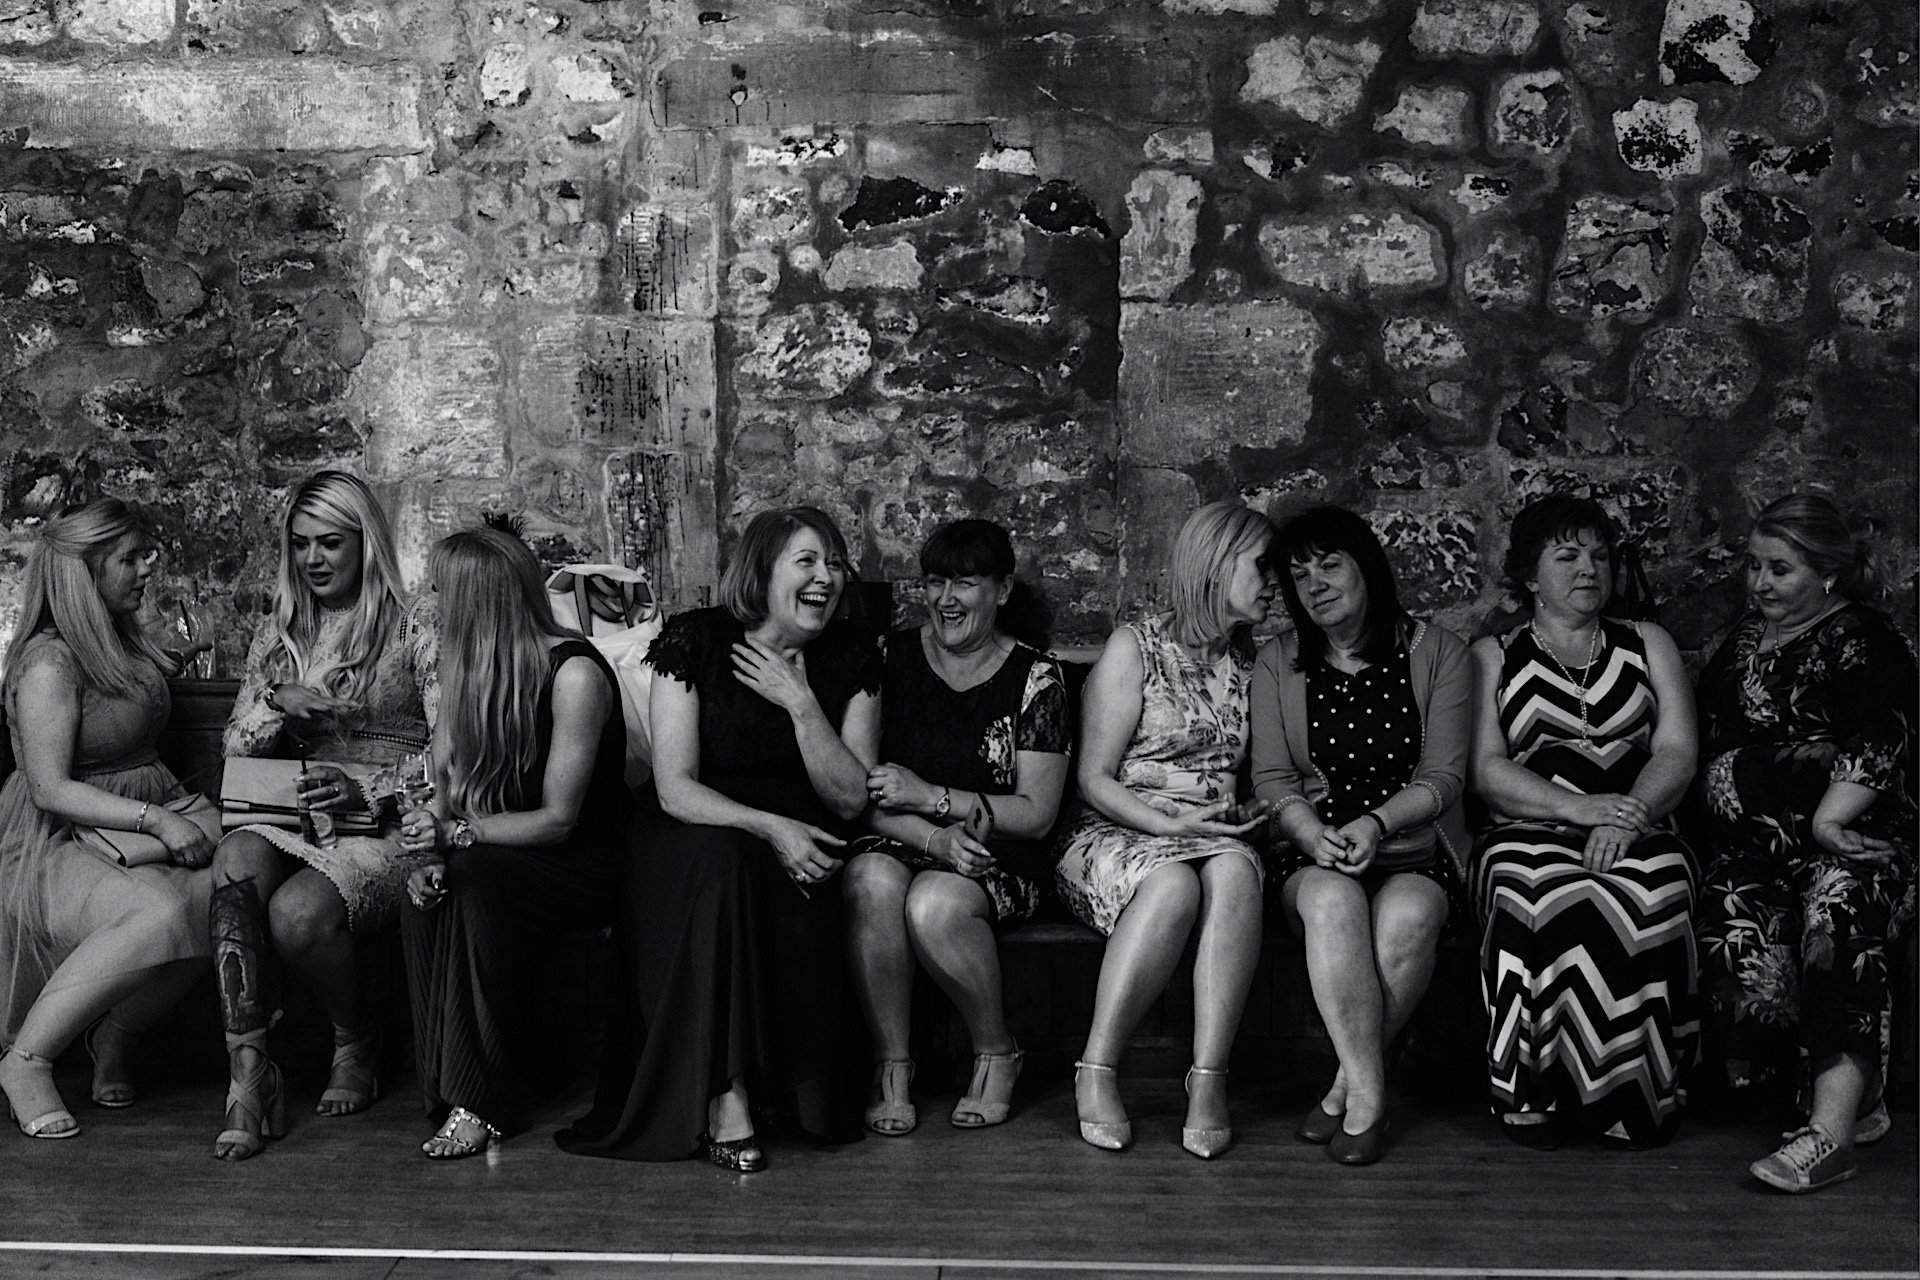 dancefloor sat chatting guests on Wedding